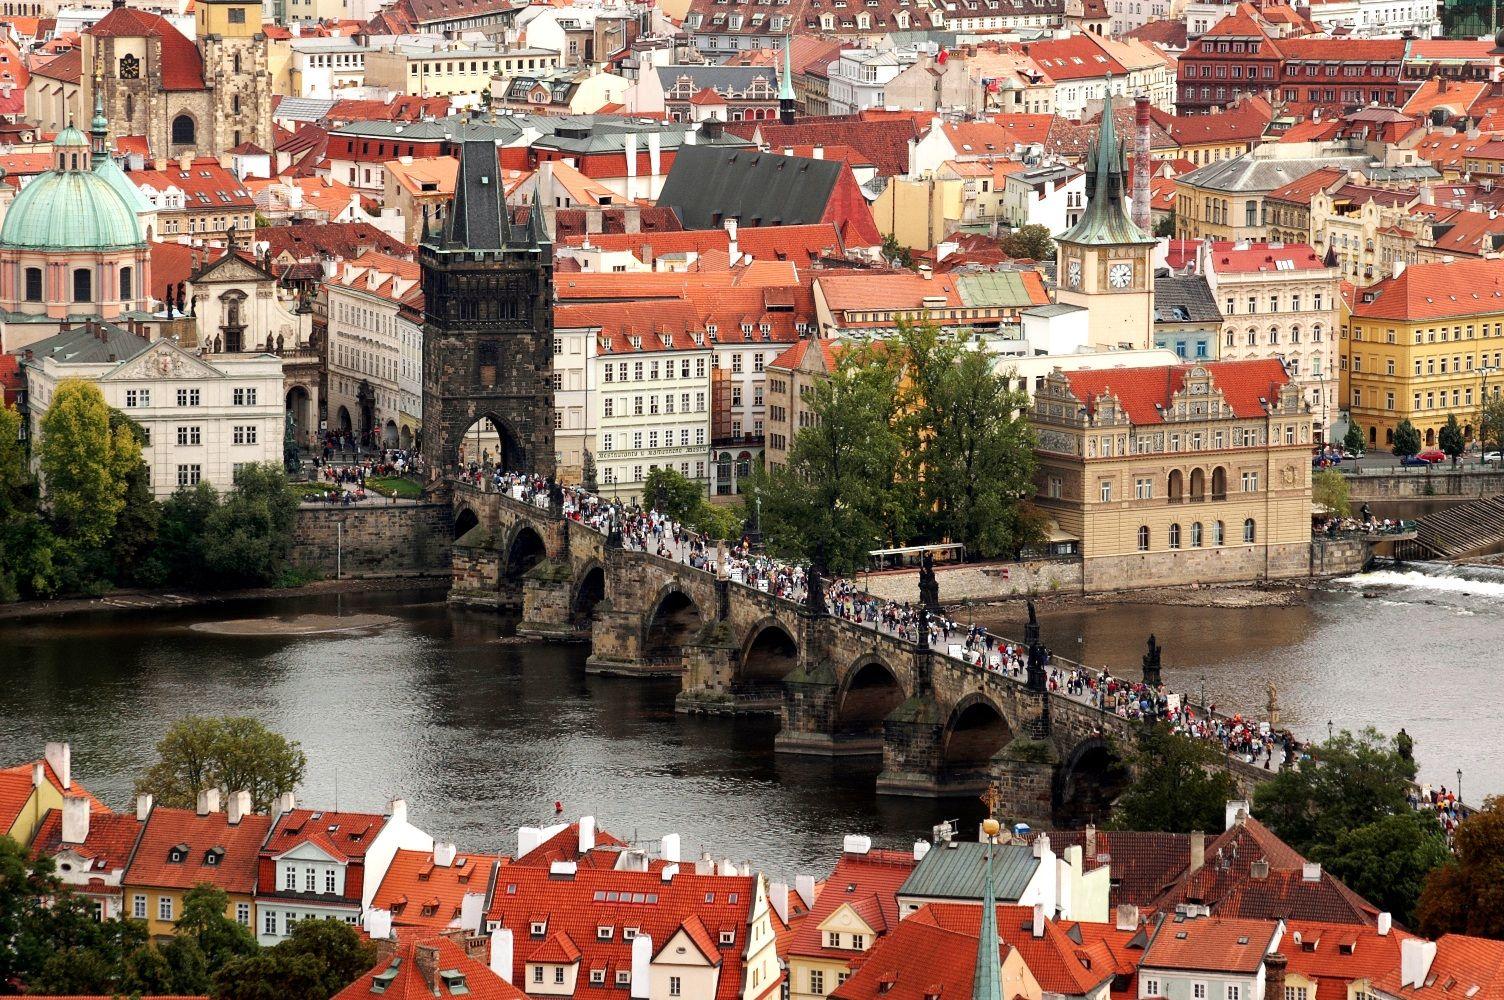 Taxă drum și vignietă Cehia - DKV EURO SERVICE